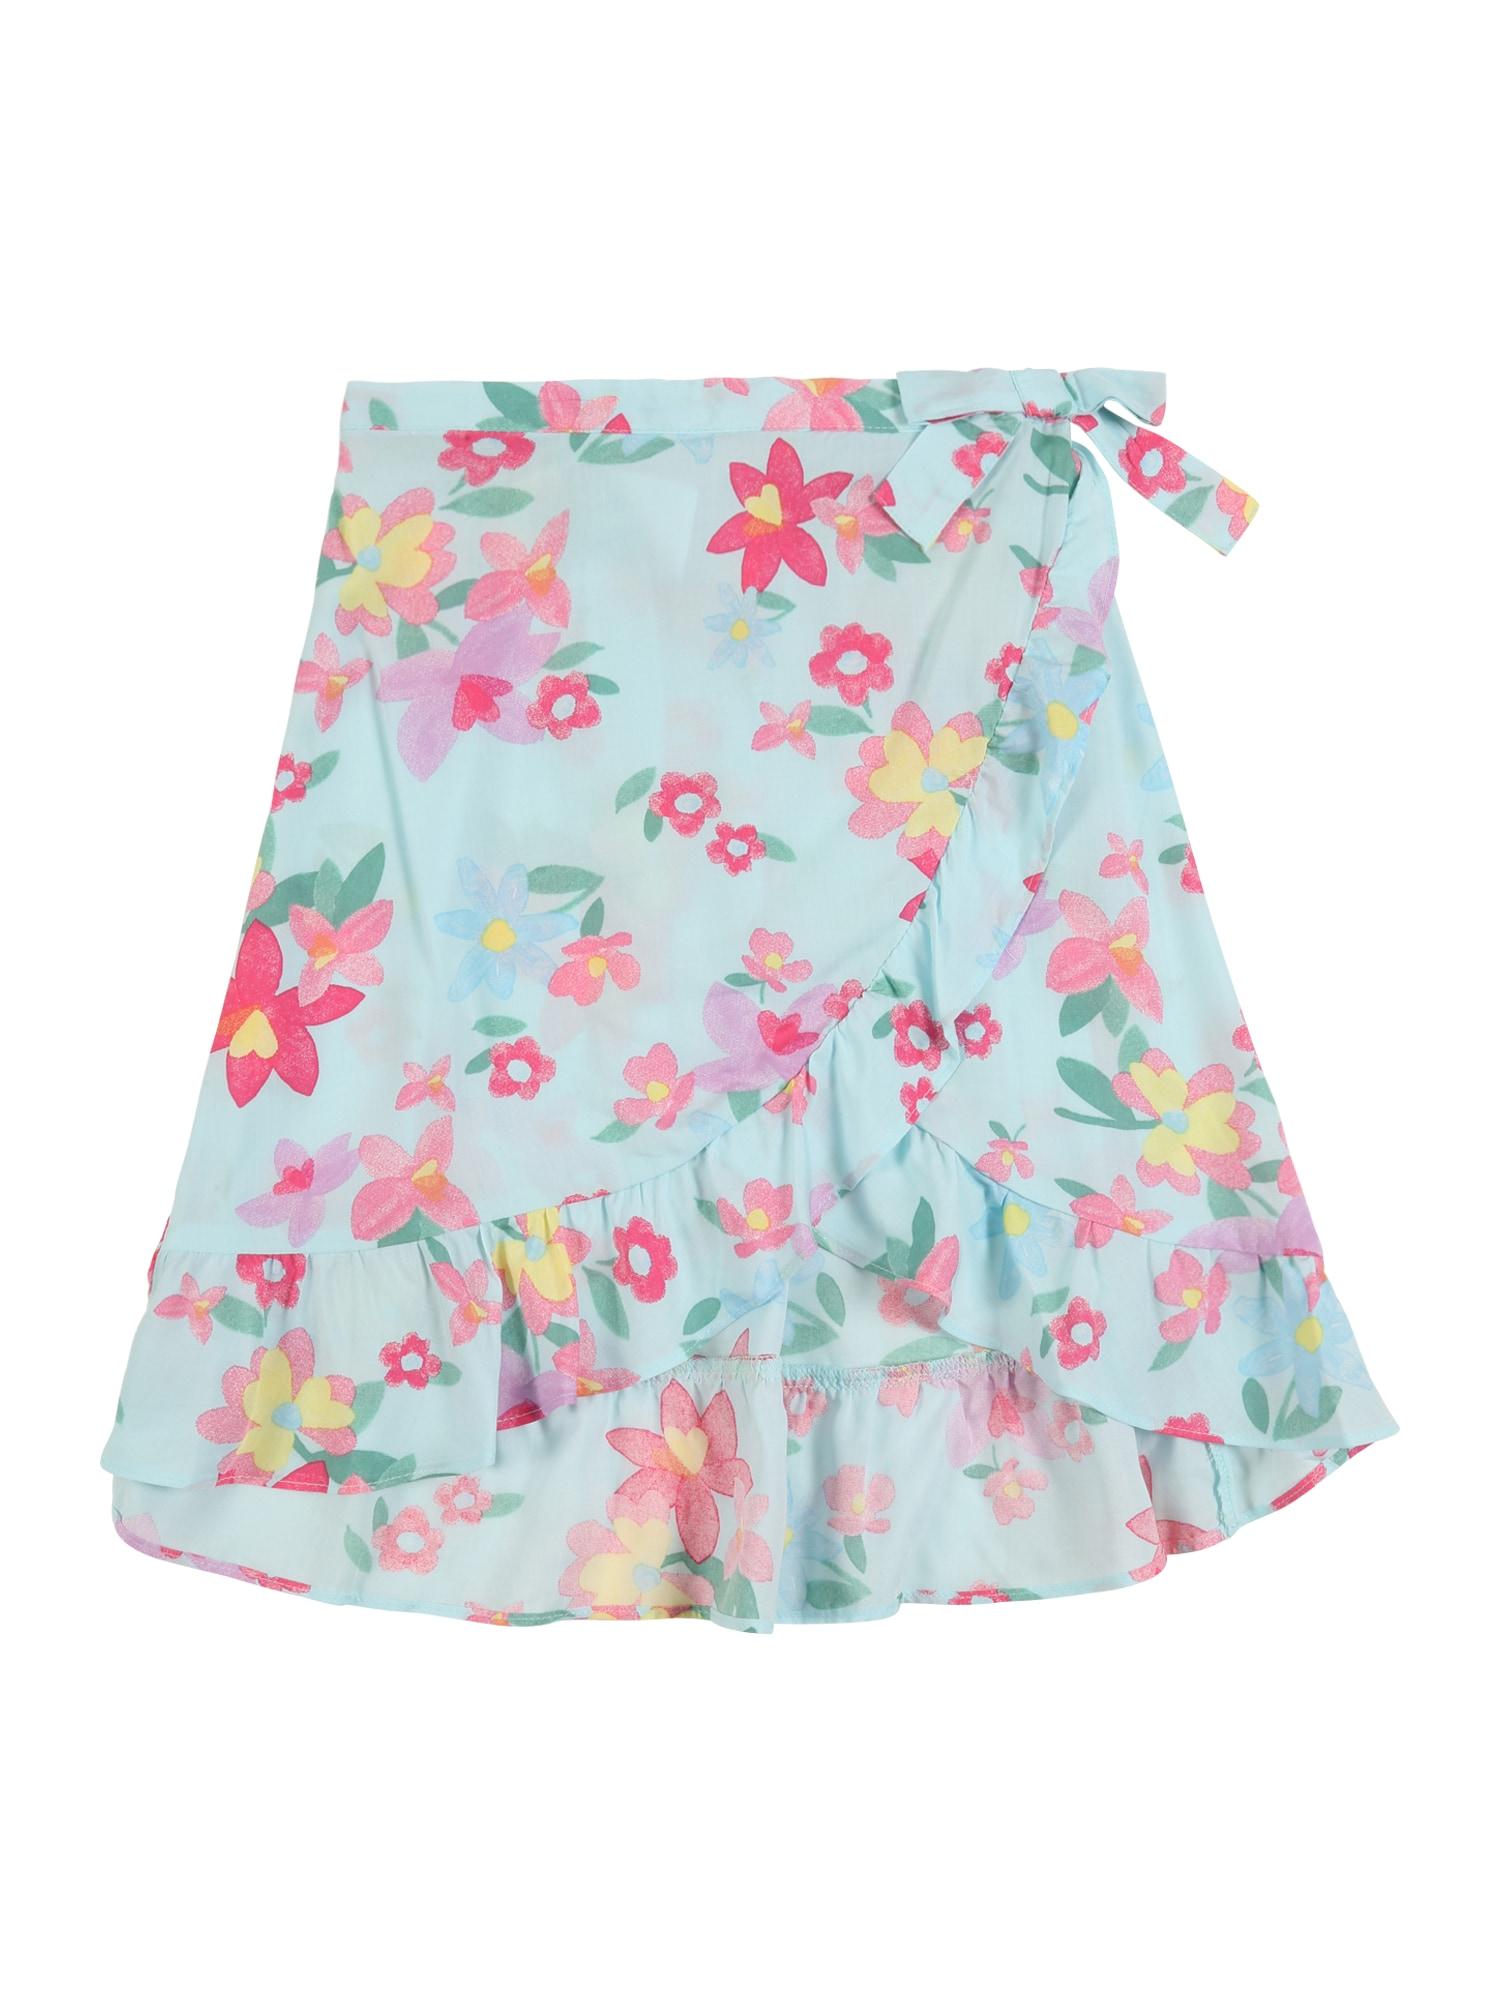 Carter's Sijonas 'Easter Collection S20 floral wrap skirt' pastelinė mėlyna / mišrios spalvos